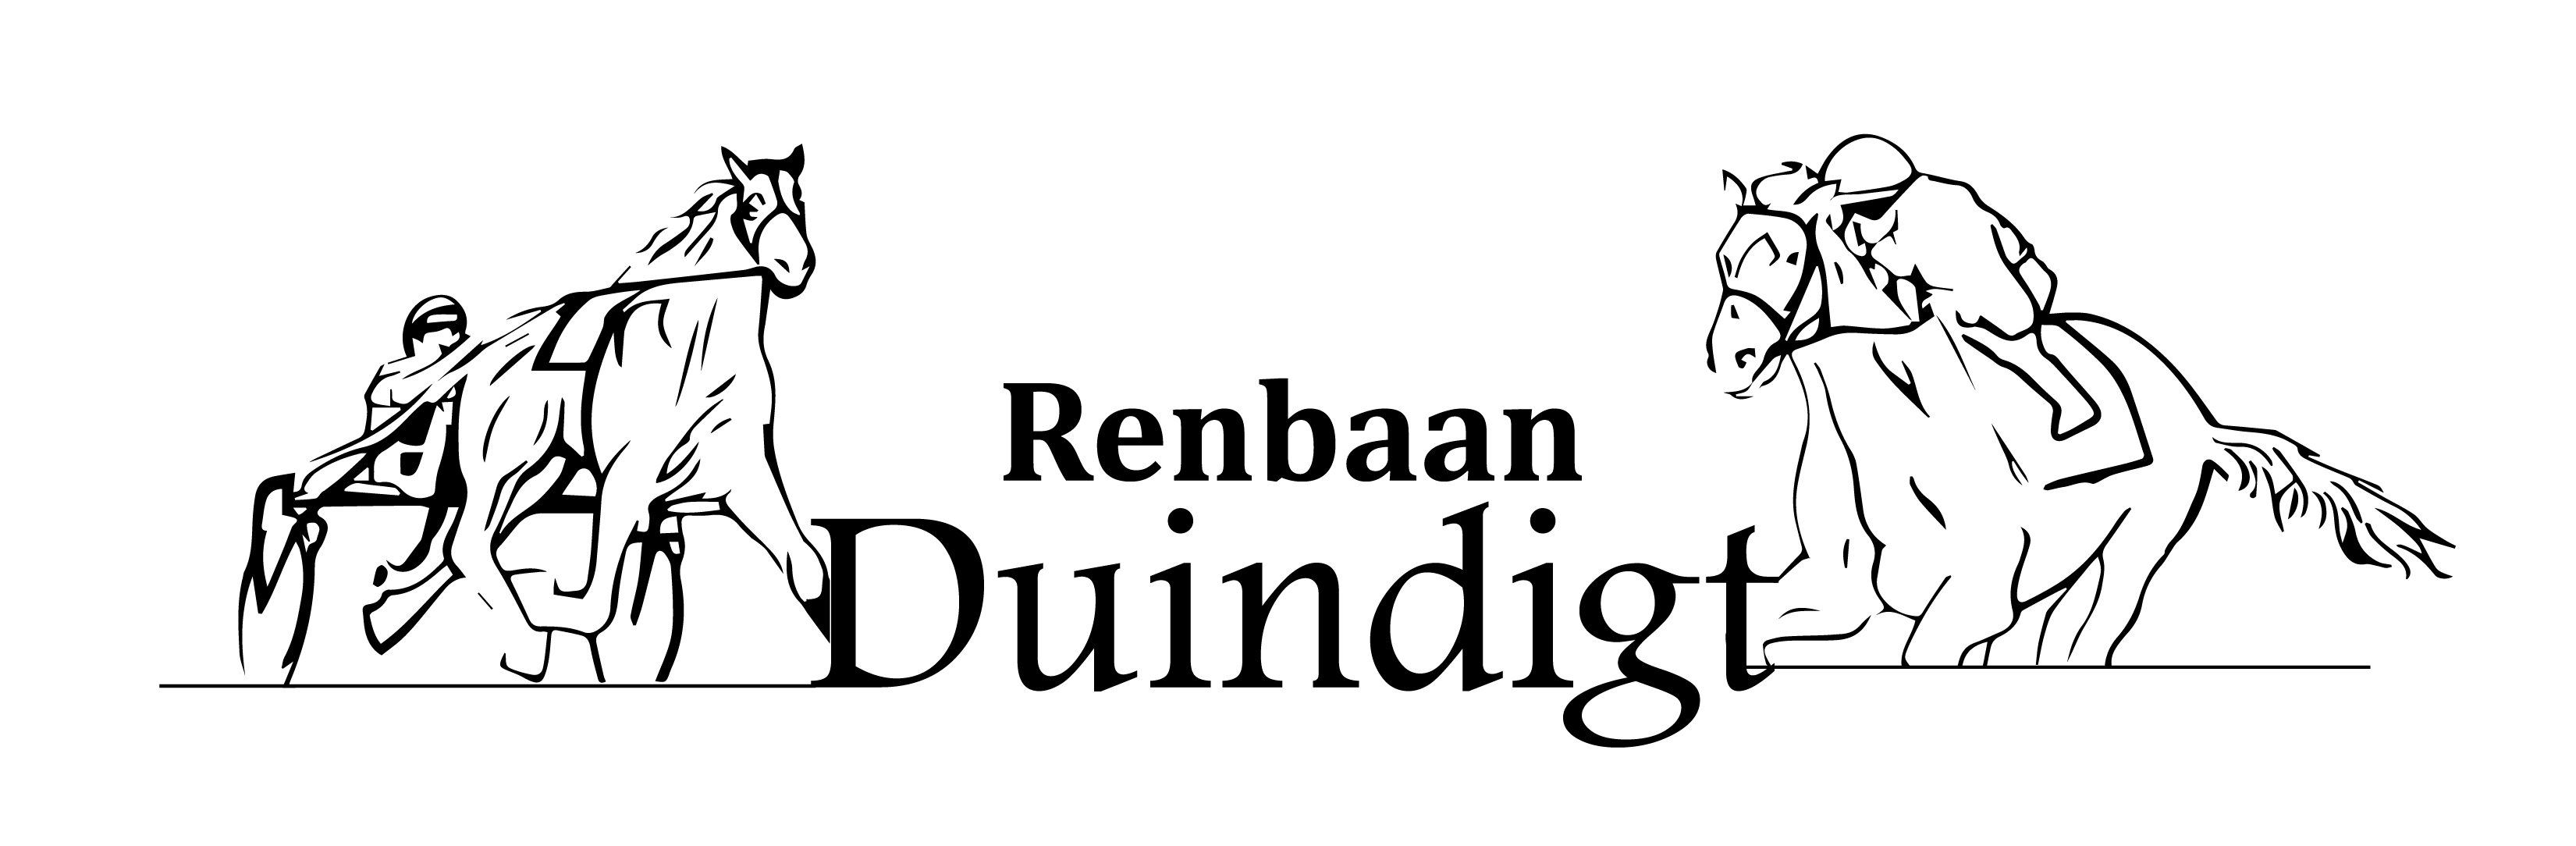 Partner Renbaan Duindigt